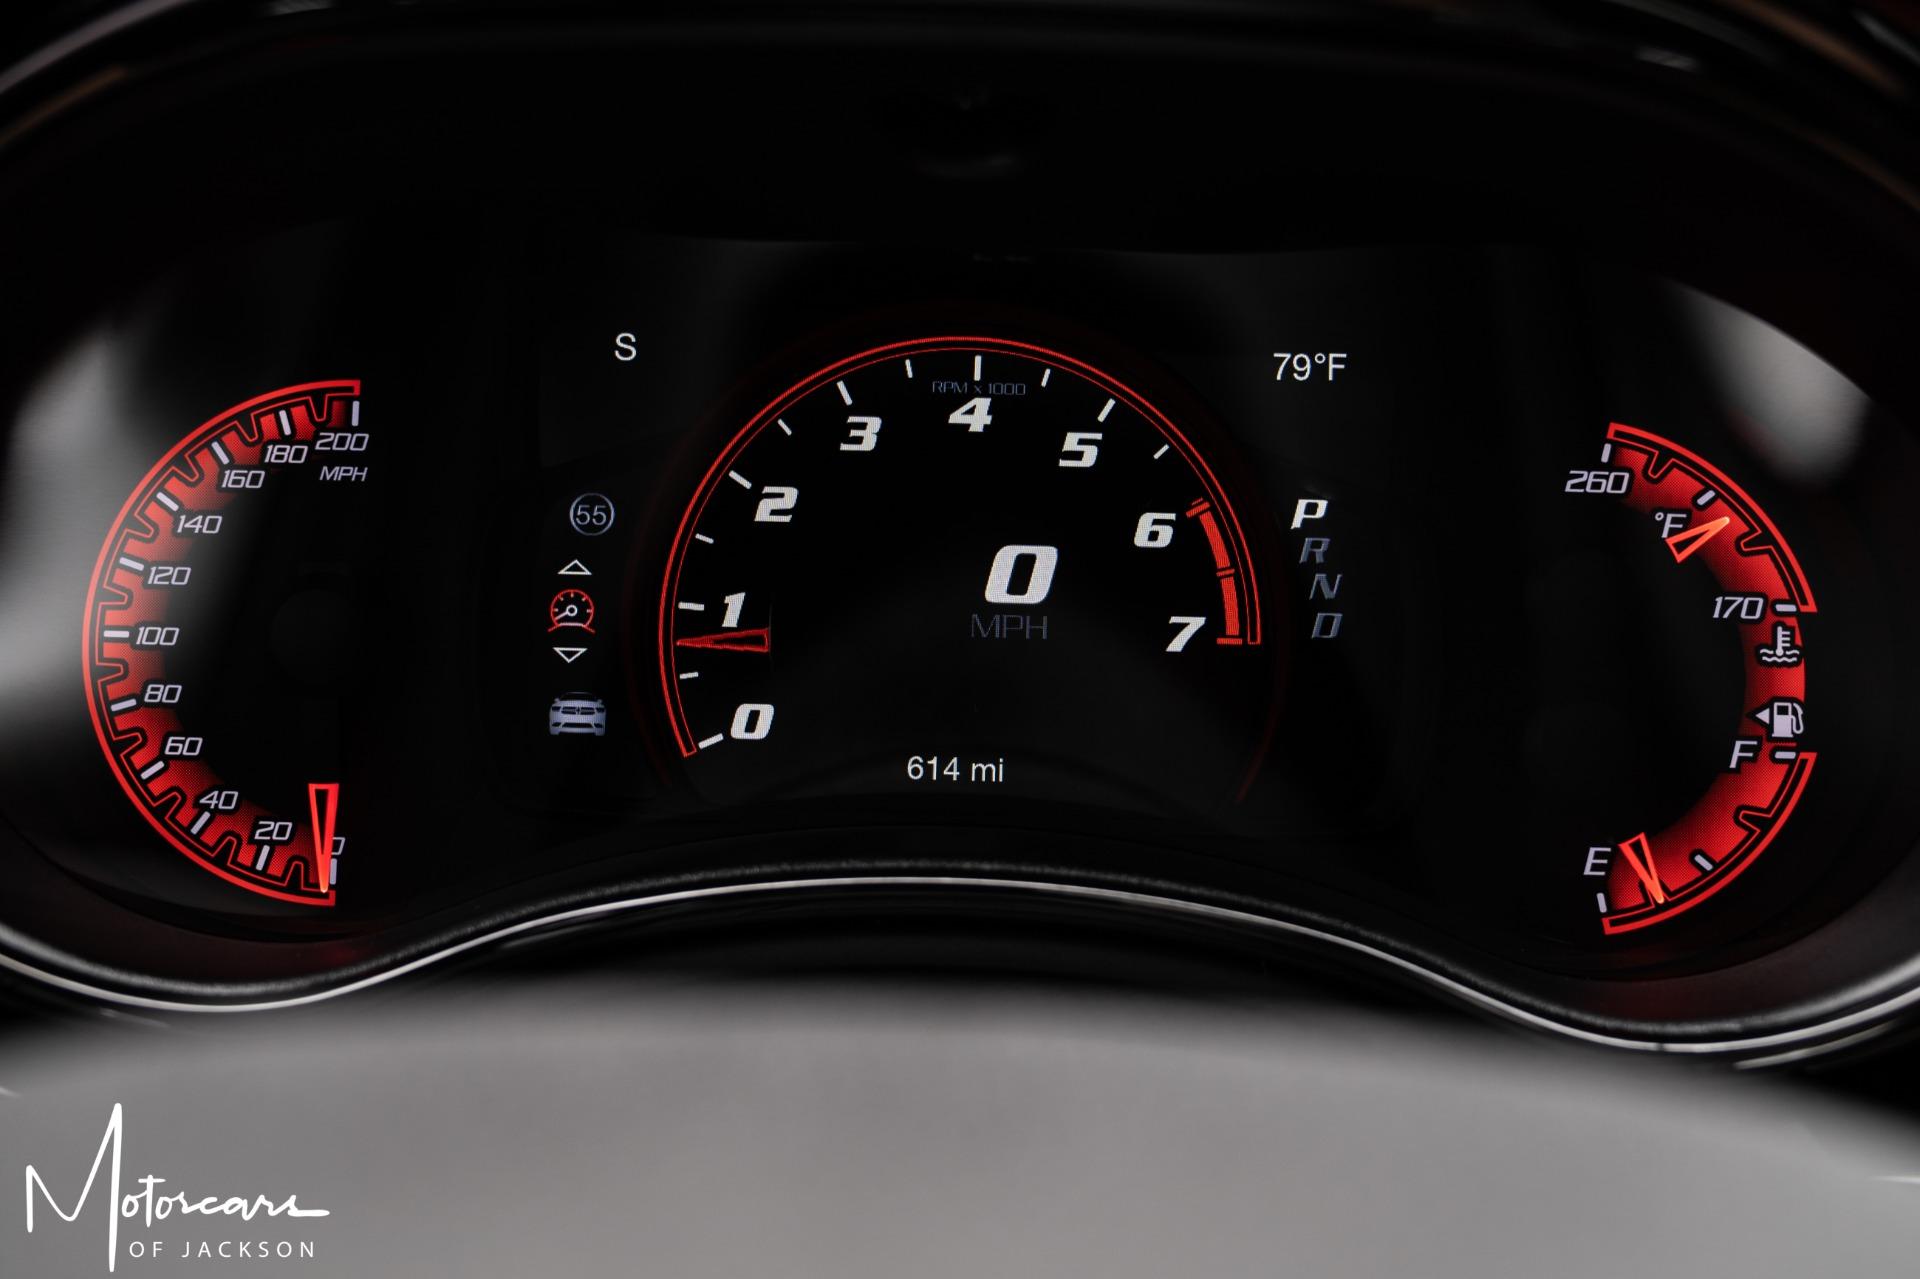 Used-2021-Dodge-Durango-SRT-Hellcat-AWD-for-sale-Jackson-MS